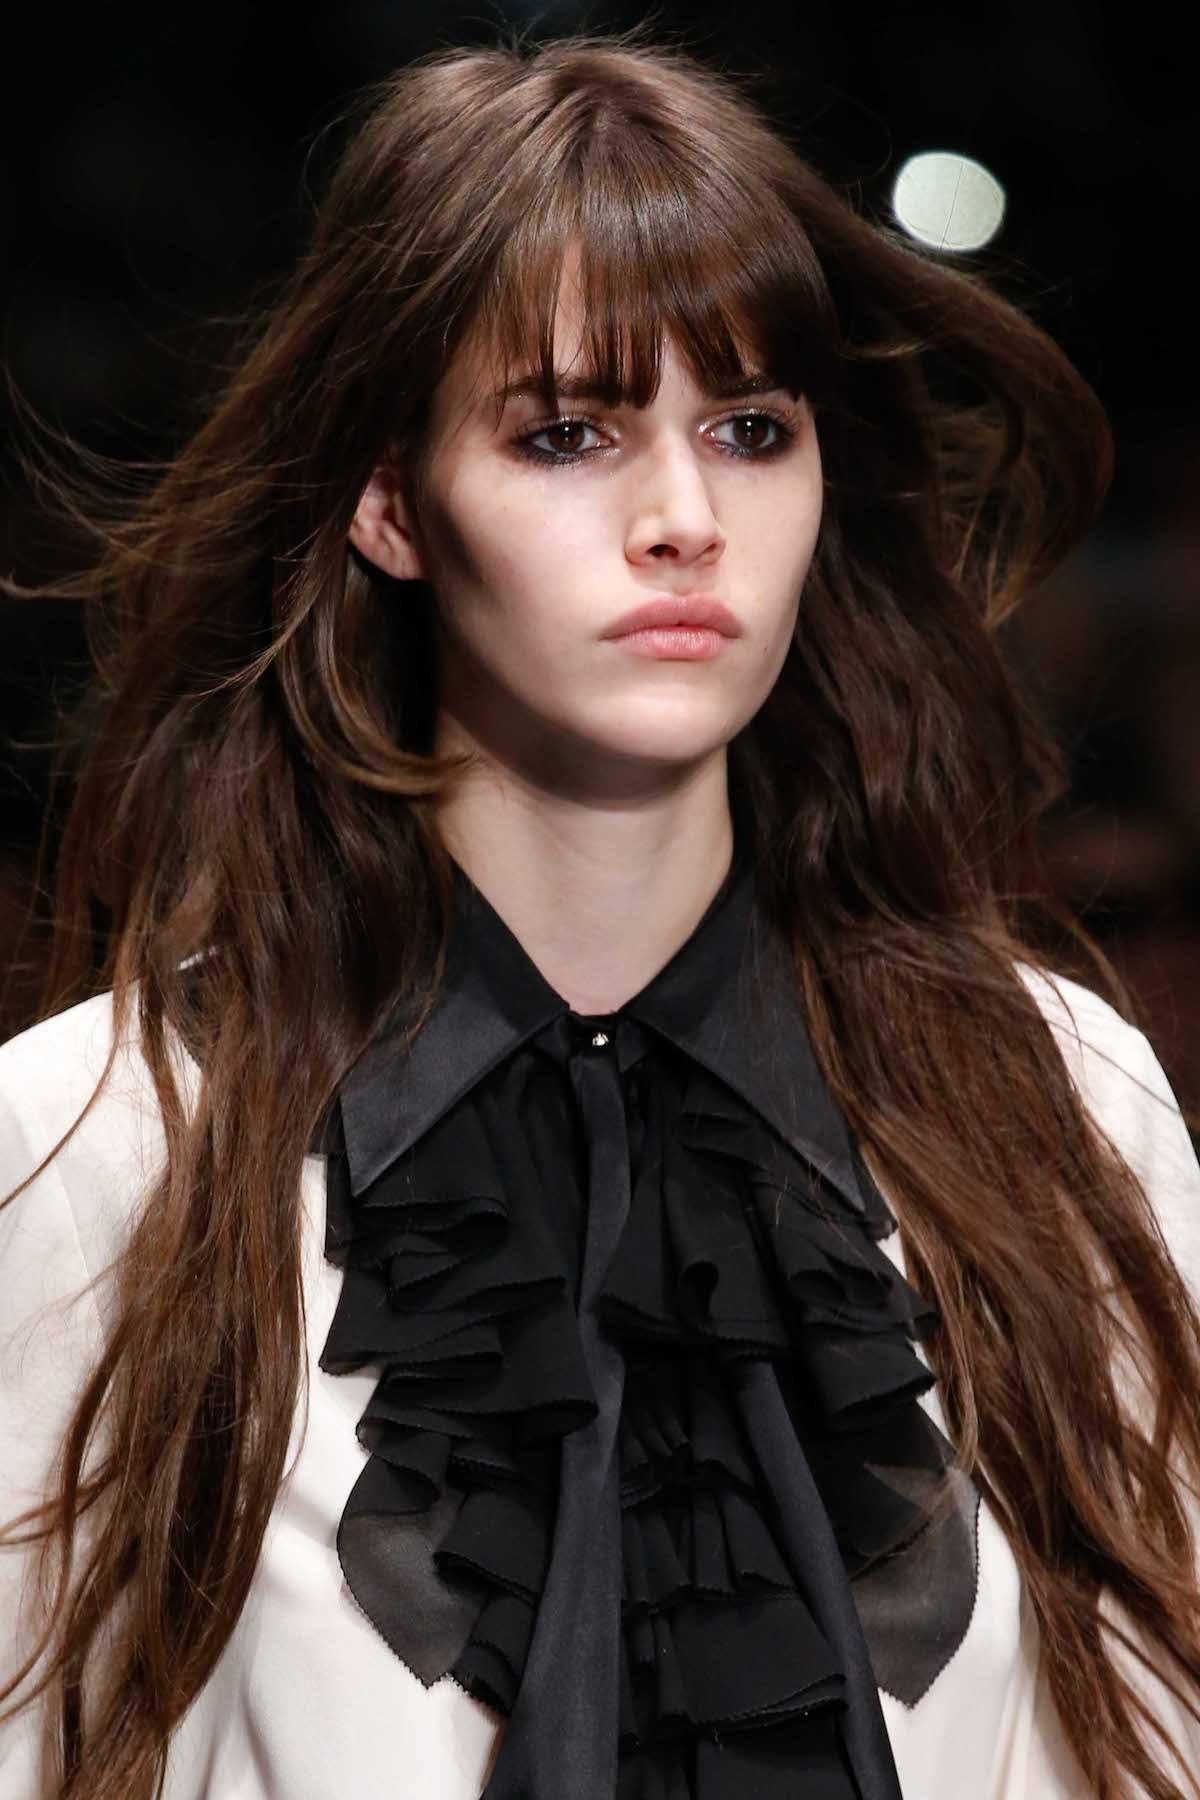 Wanita kaukasia dengan model rambut layer panjang